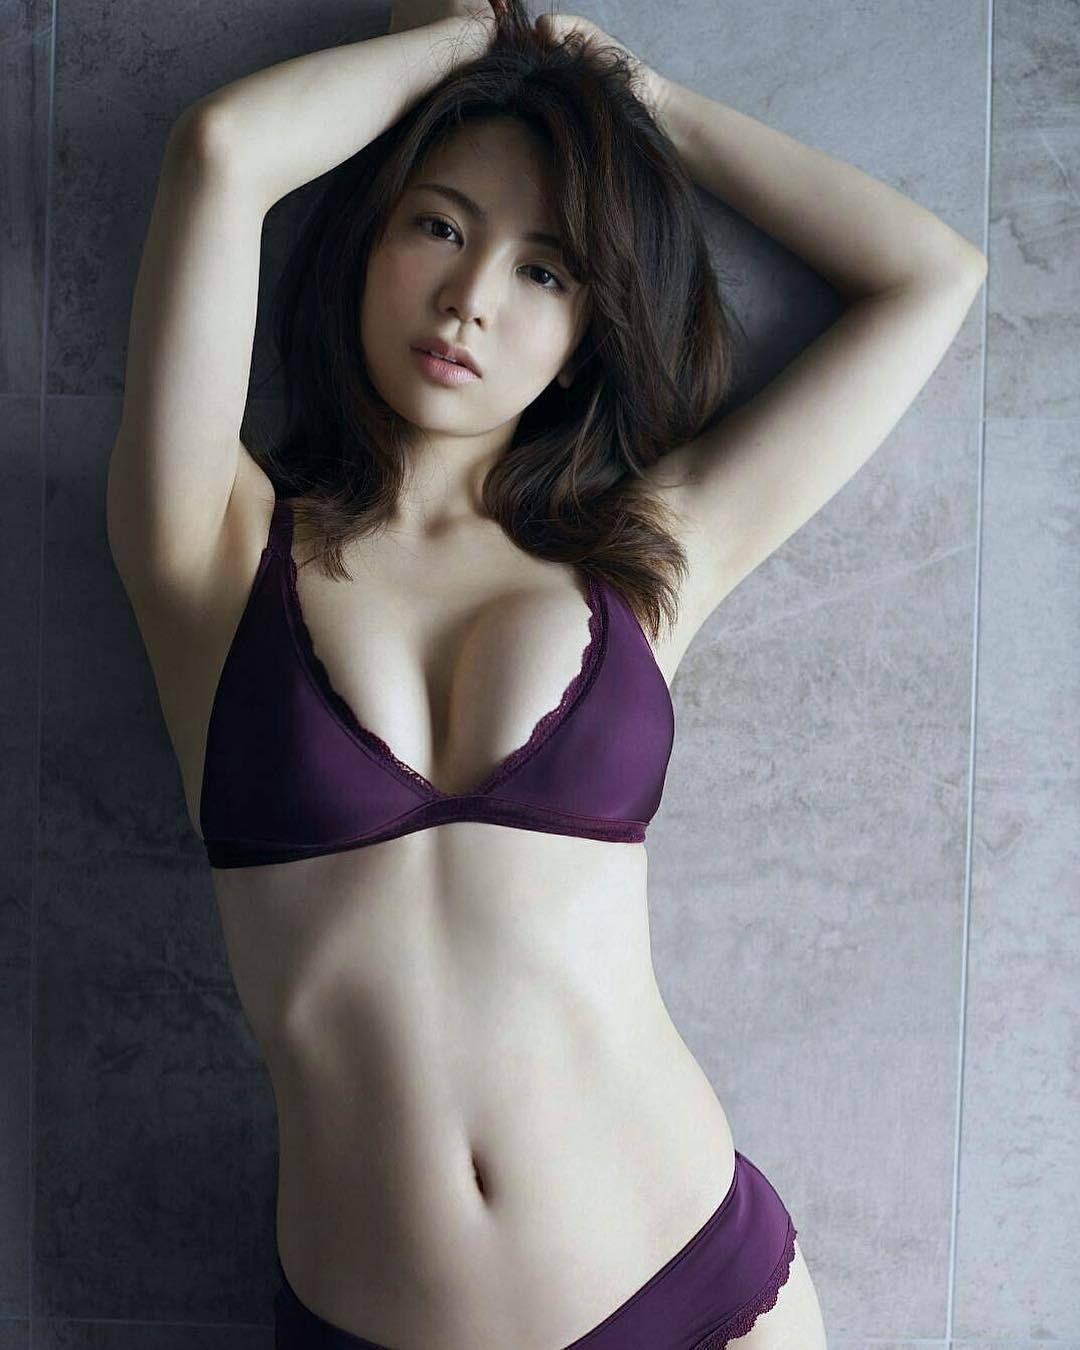 Miu Nakamura 中村美海 J Beauty Pinterest Ads